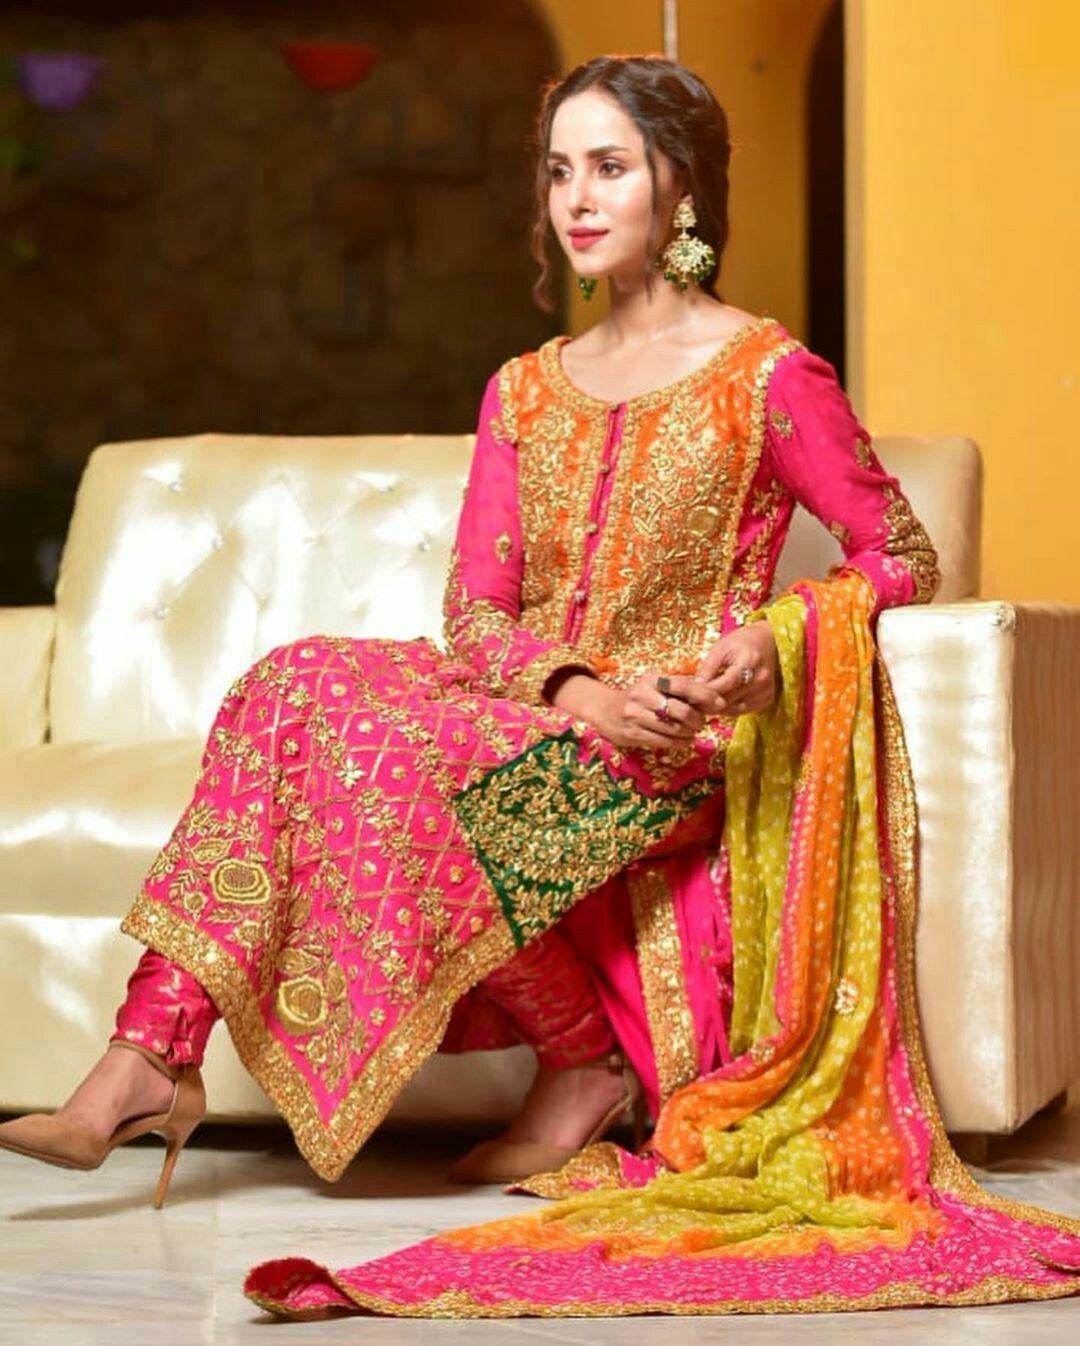 Pin on Pakistani models